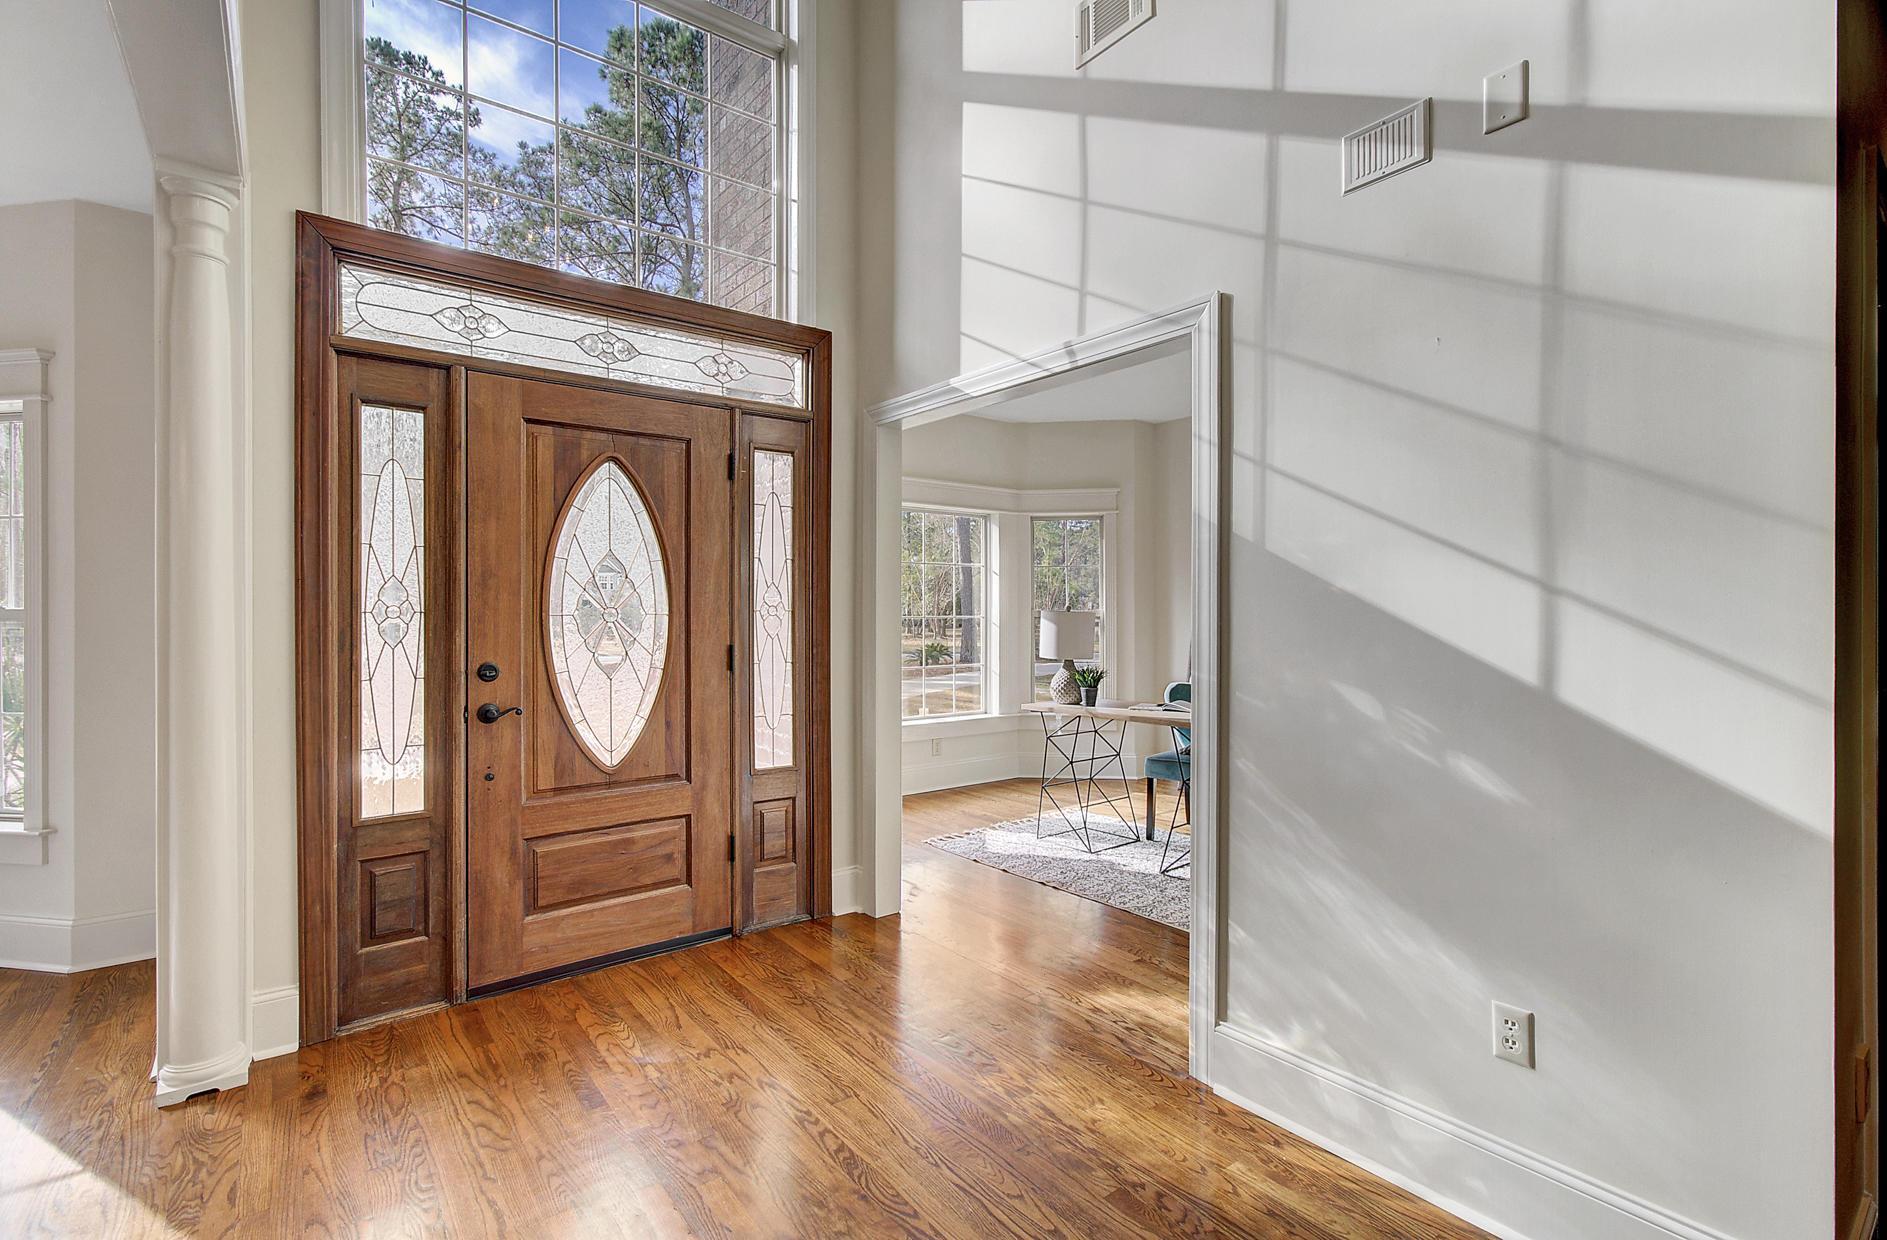 Dunes West Homes For Sale - 4123 Colonel Vanderhorst, Mount Pleasant, SC - 26